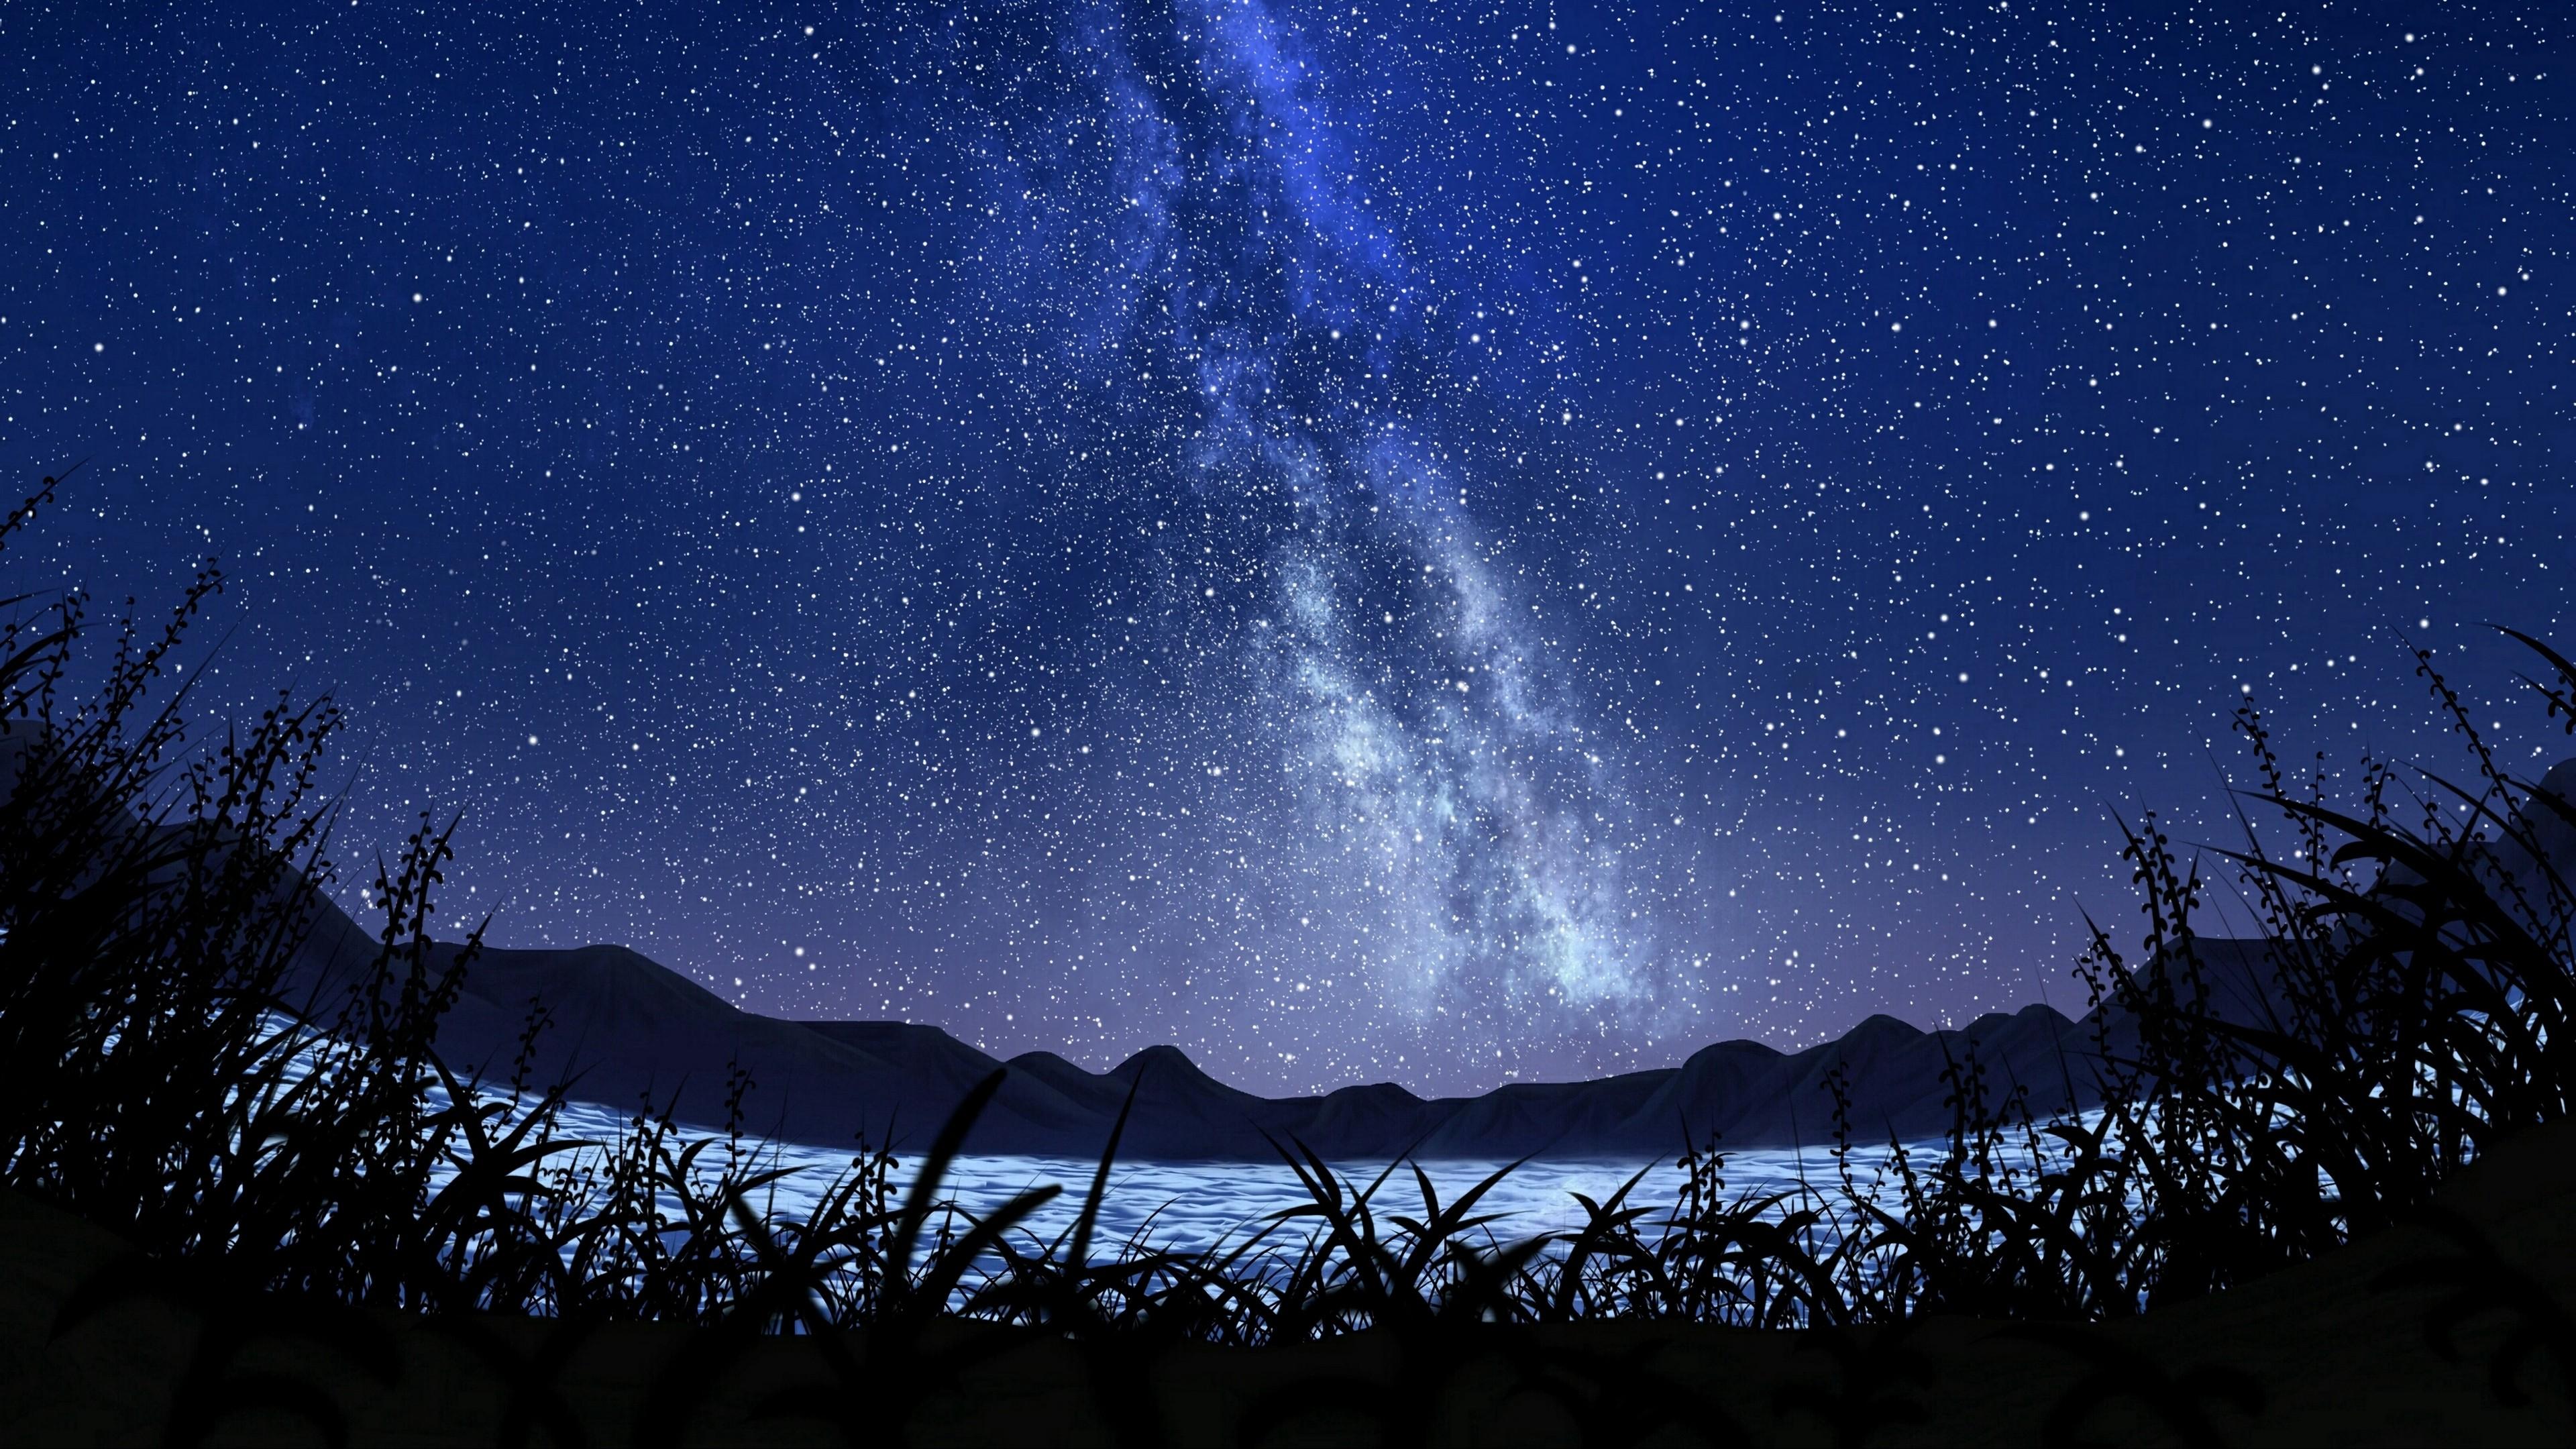 4K Stars Starry Sky Milky Way Wallpaper - [3840x2160]